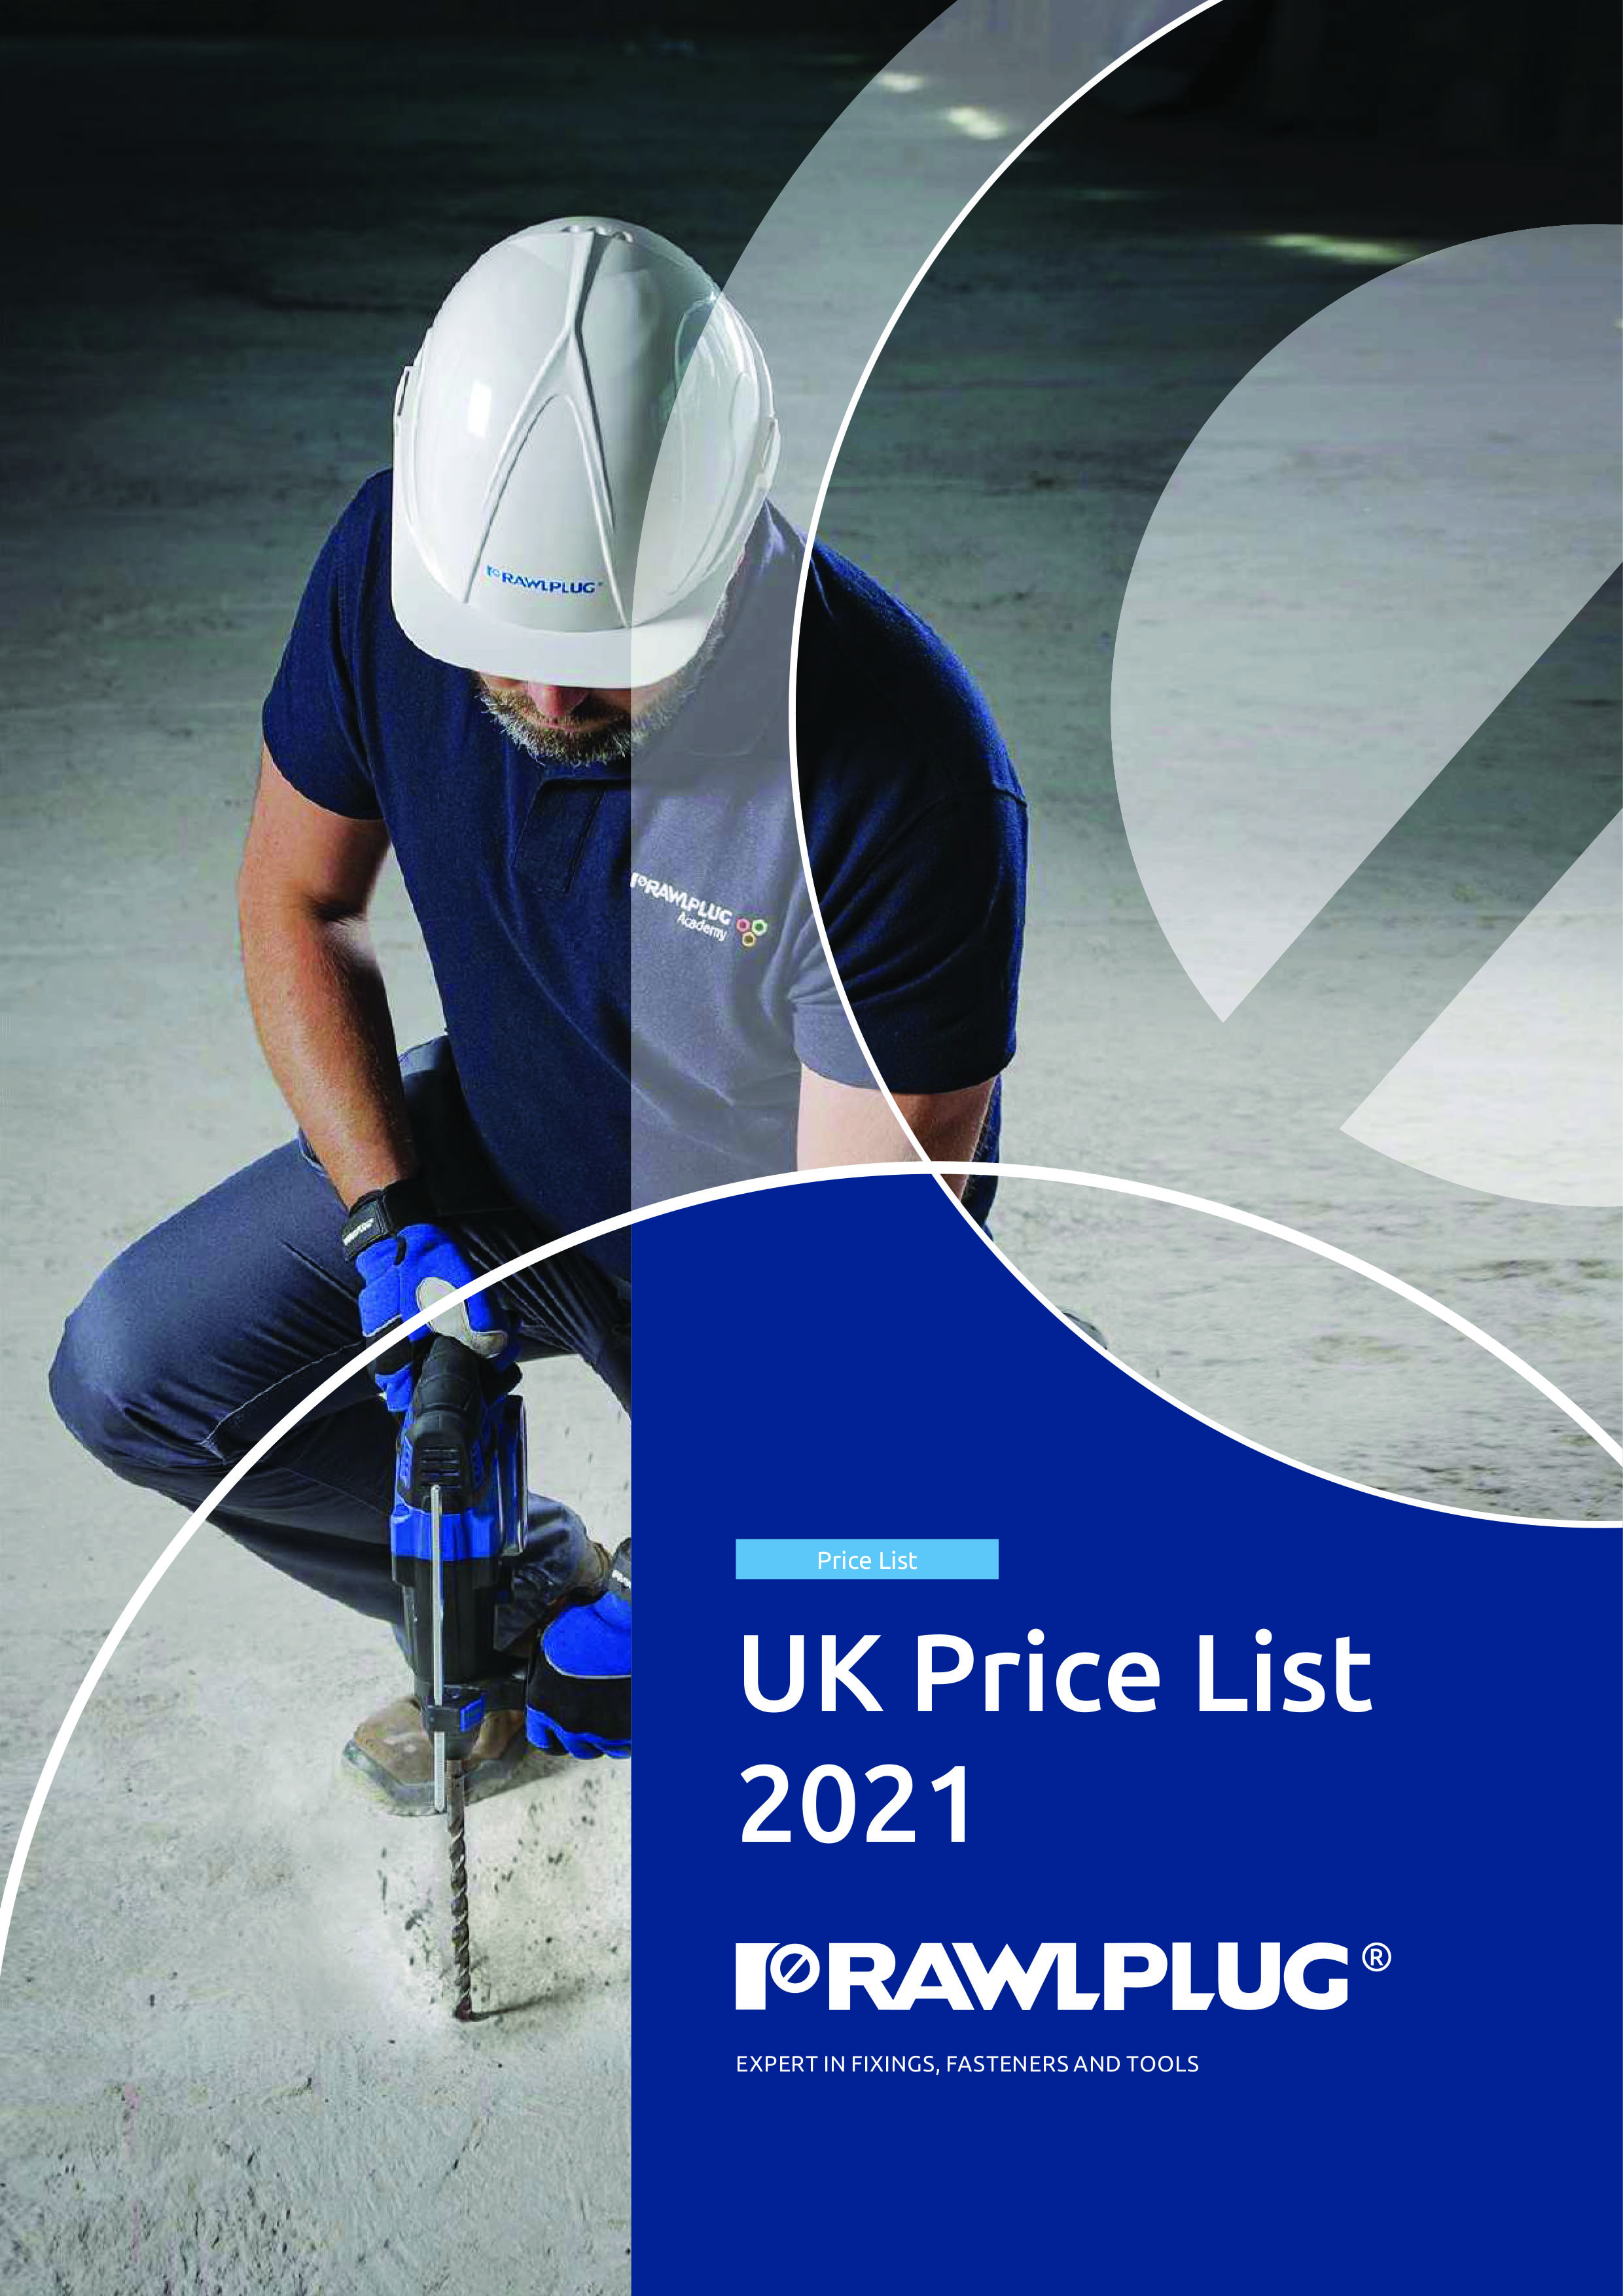 UK Price List 2021